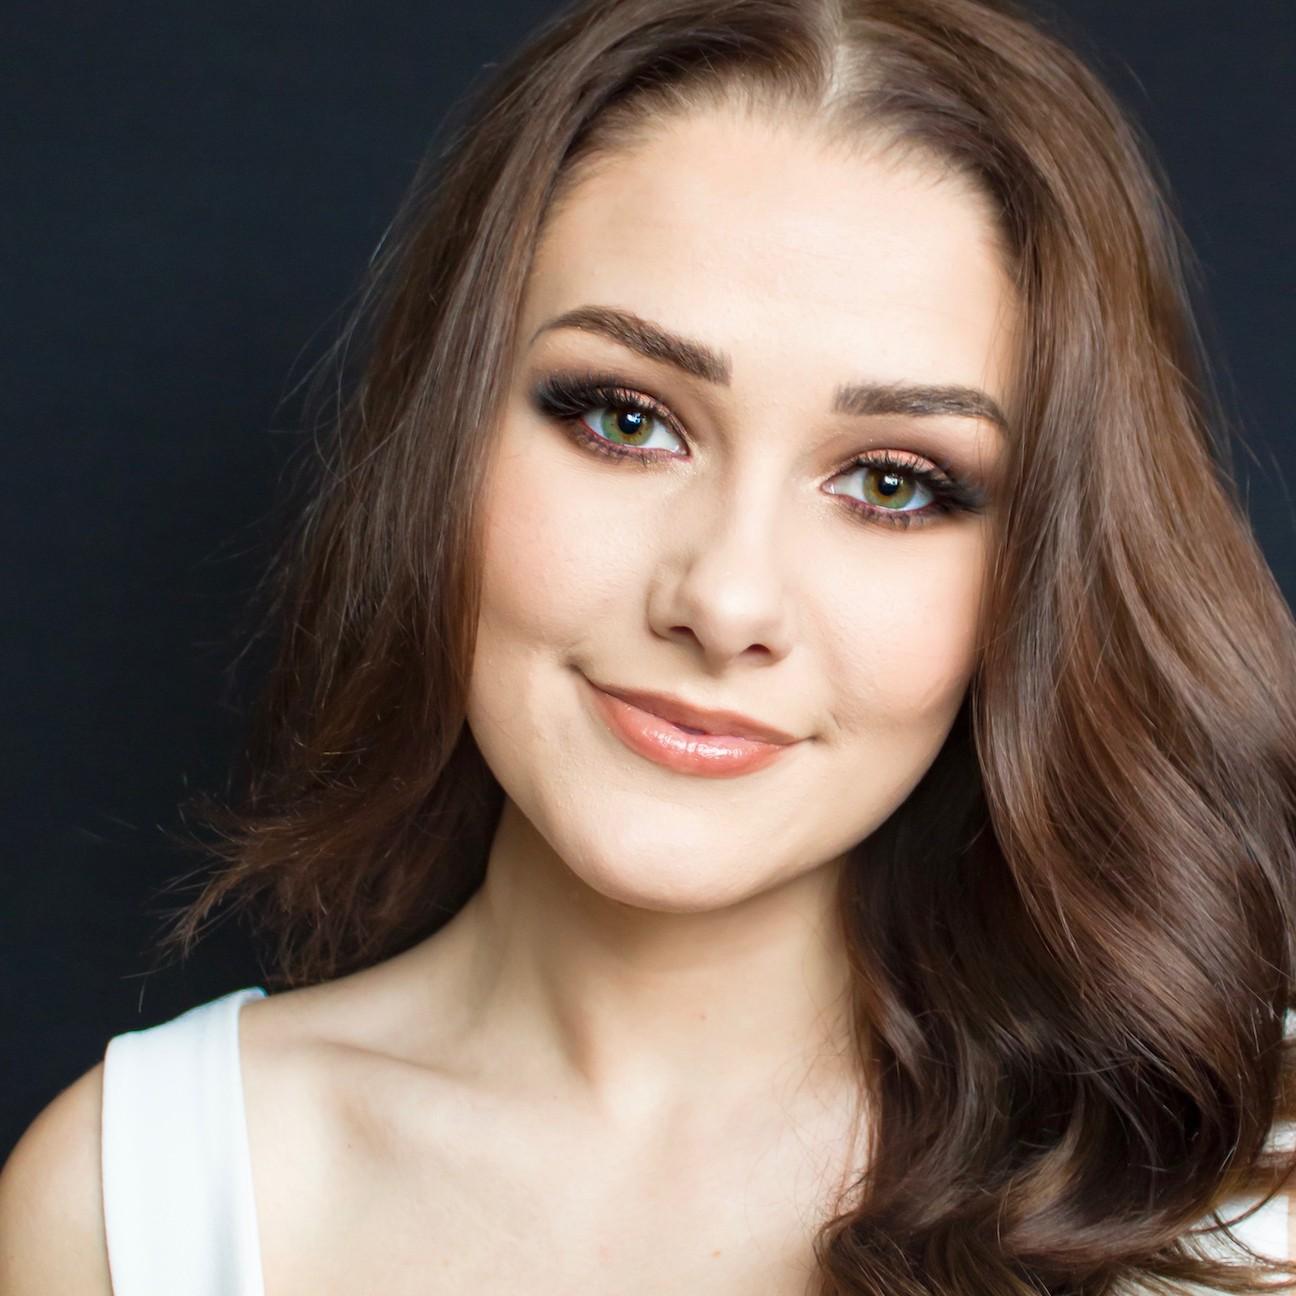 Brittany Georgia